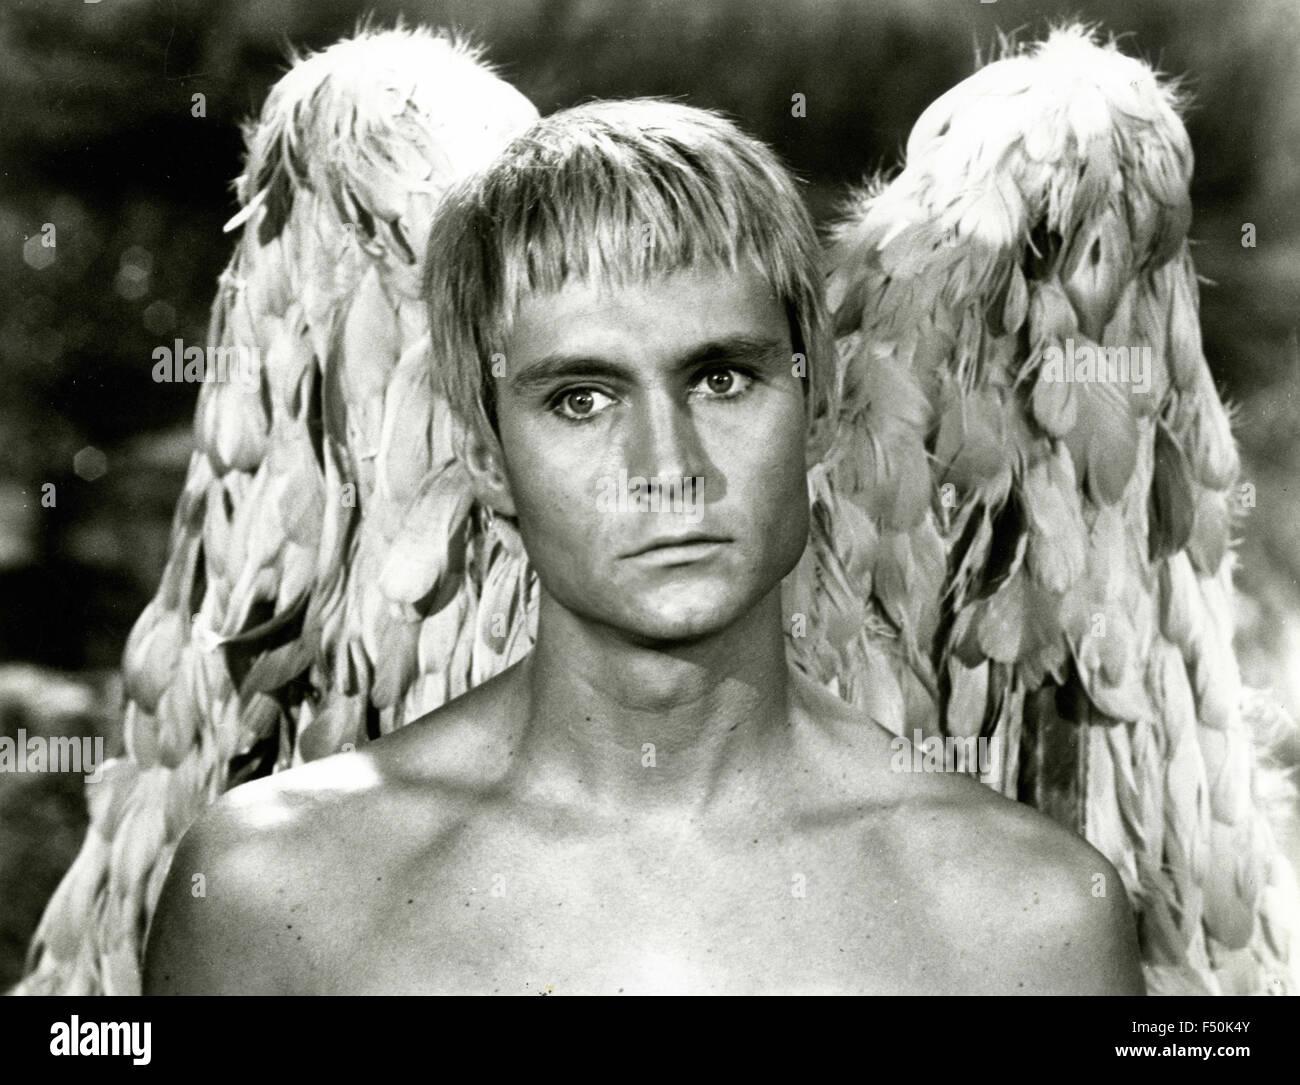 Actor John Phillip Law in a scene from the film 'Barbarella', 1968 - Stock Image